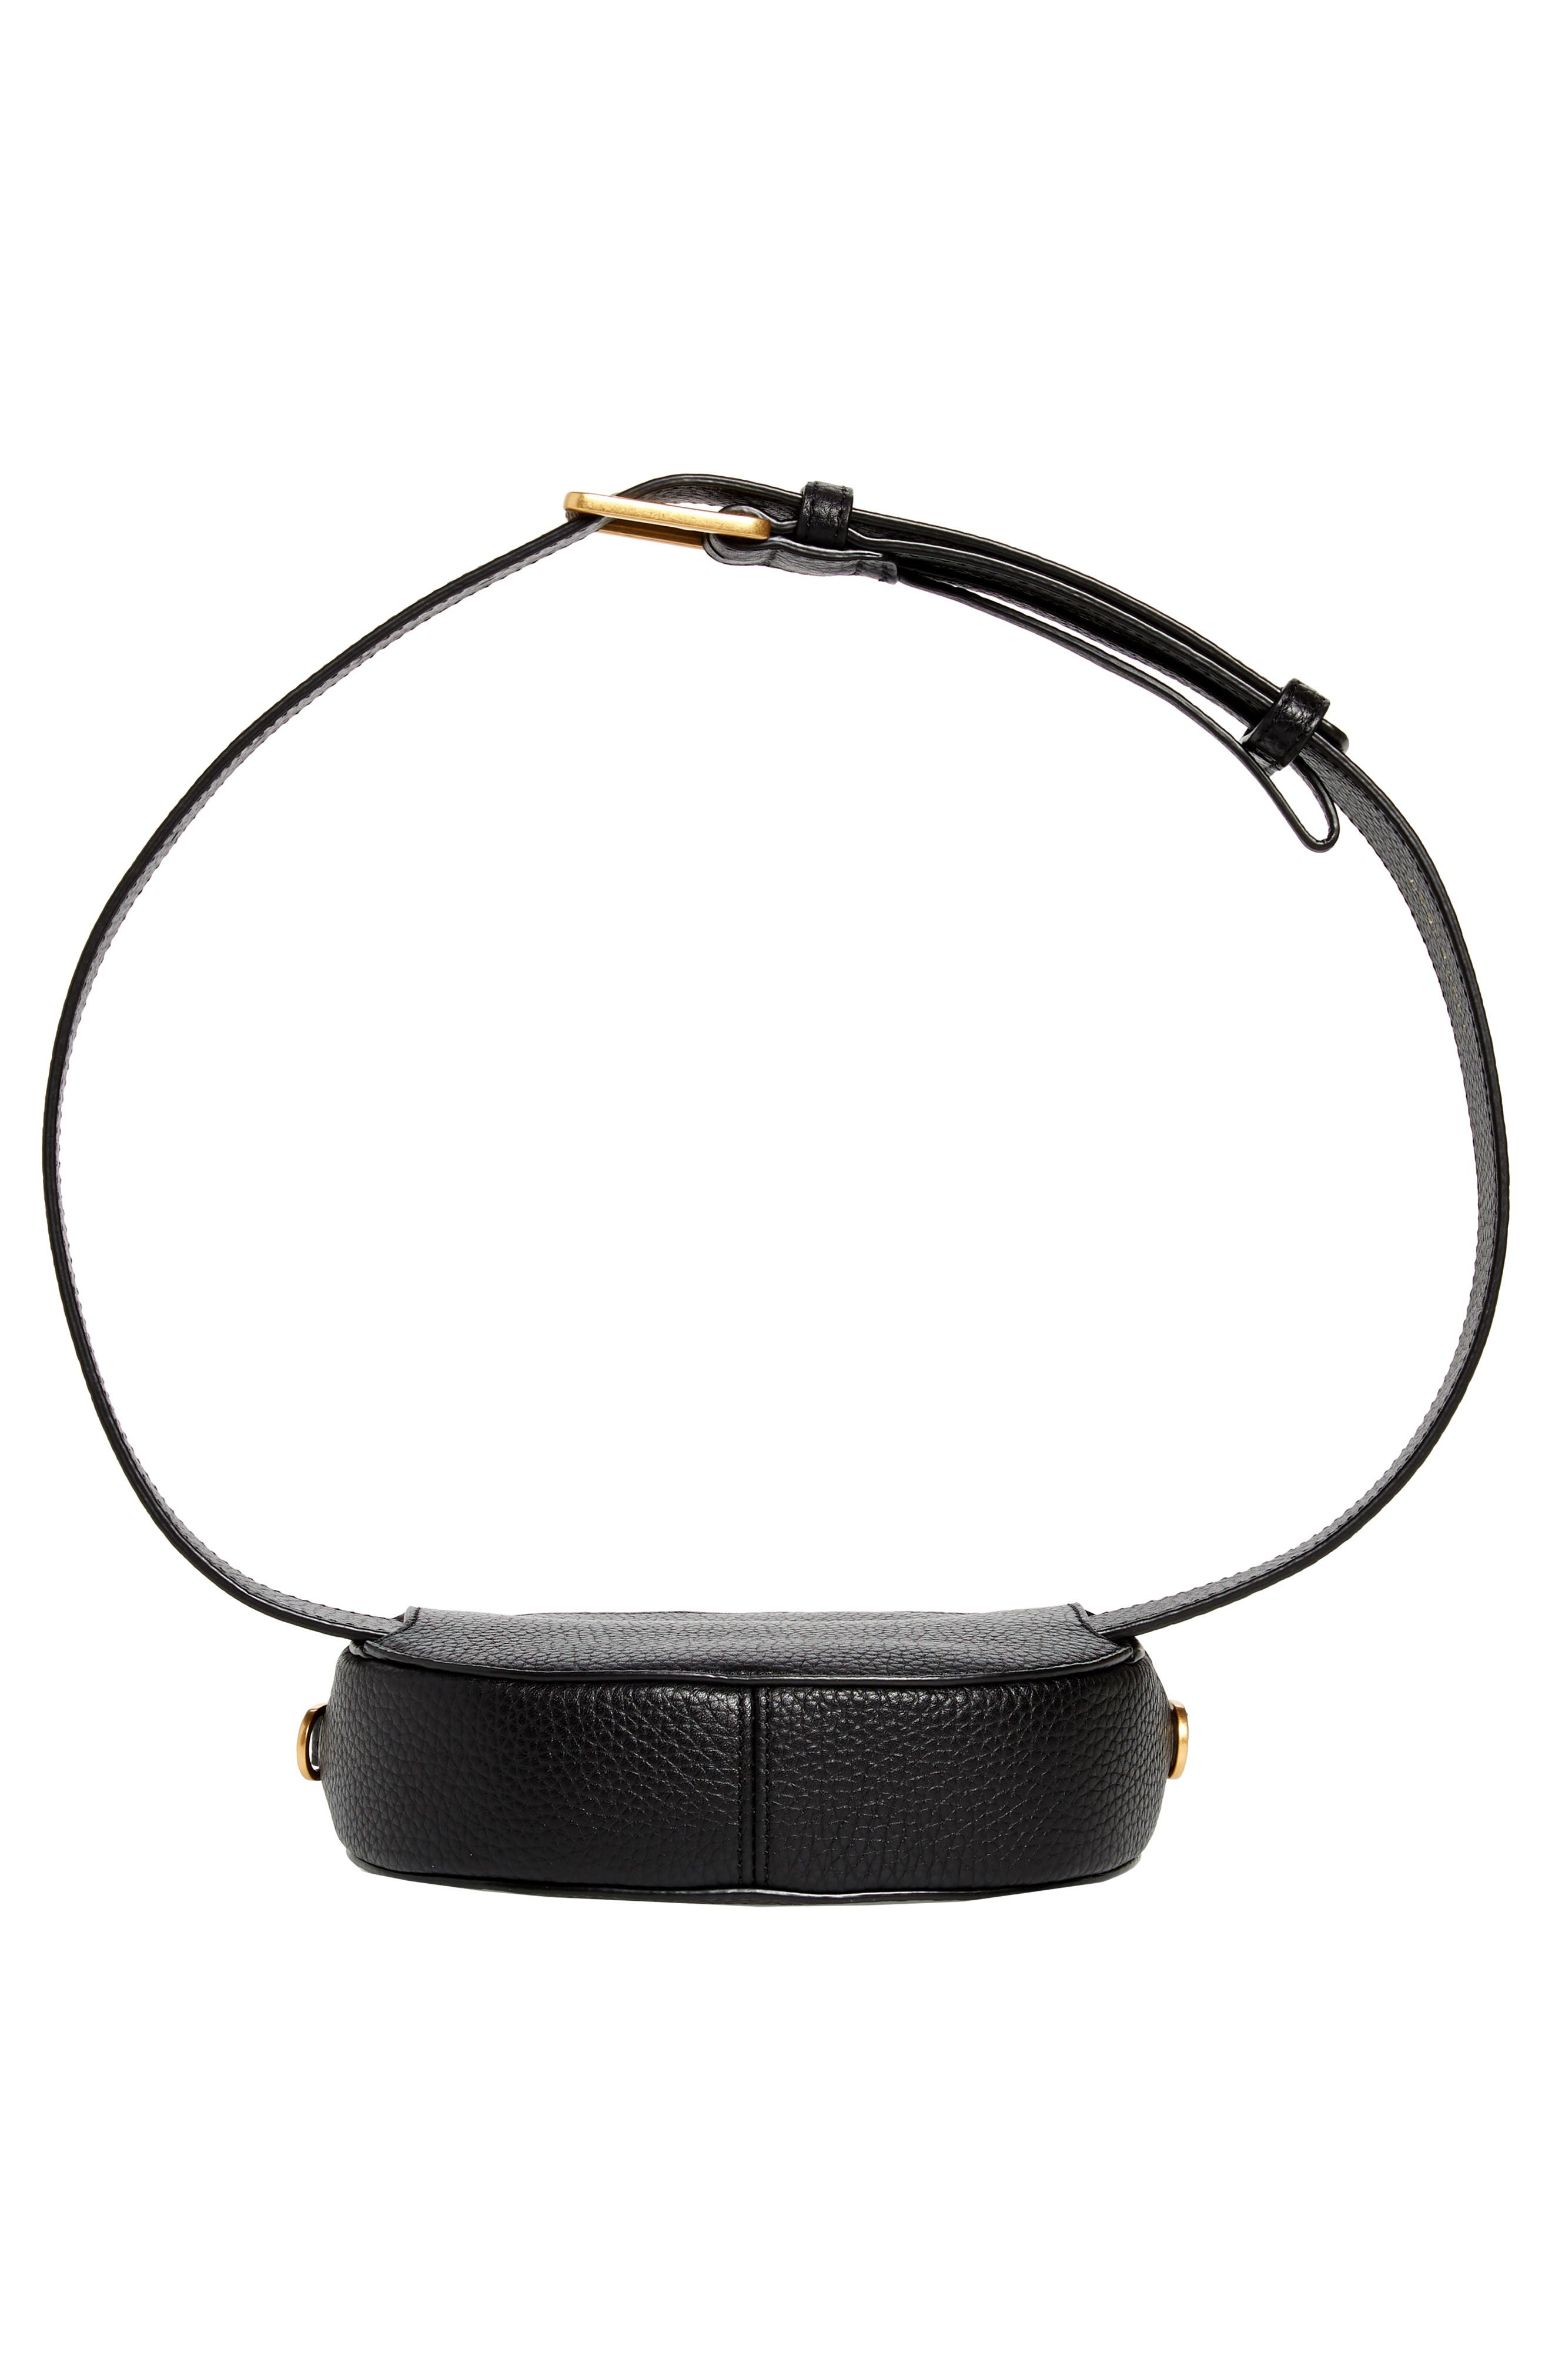 McGraw Leather Belt/Crossbody Bag,                             Alternate thumbnail 8, color,                             001